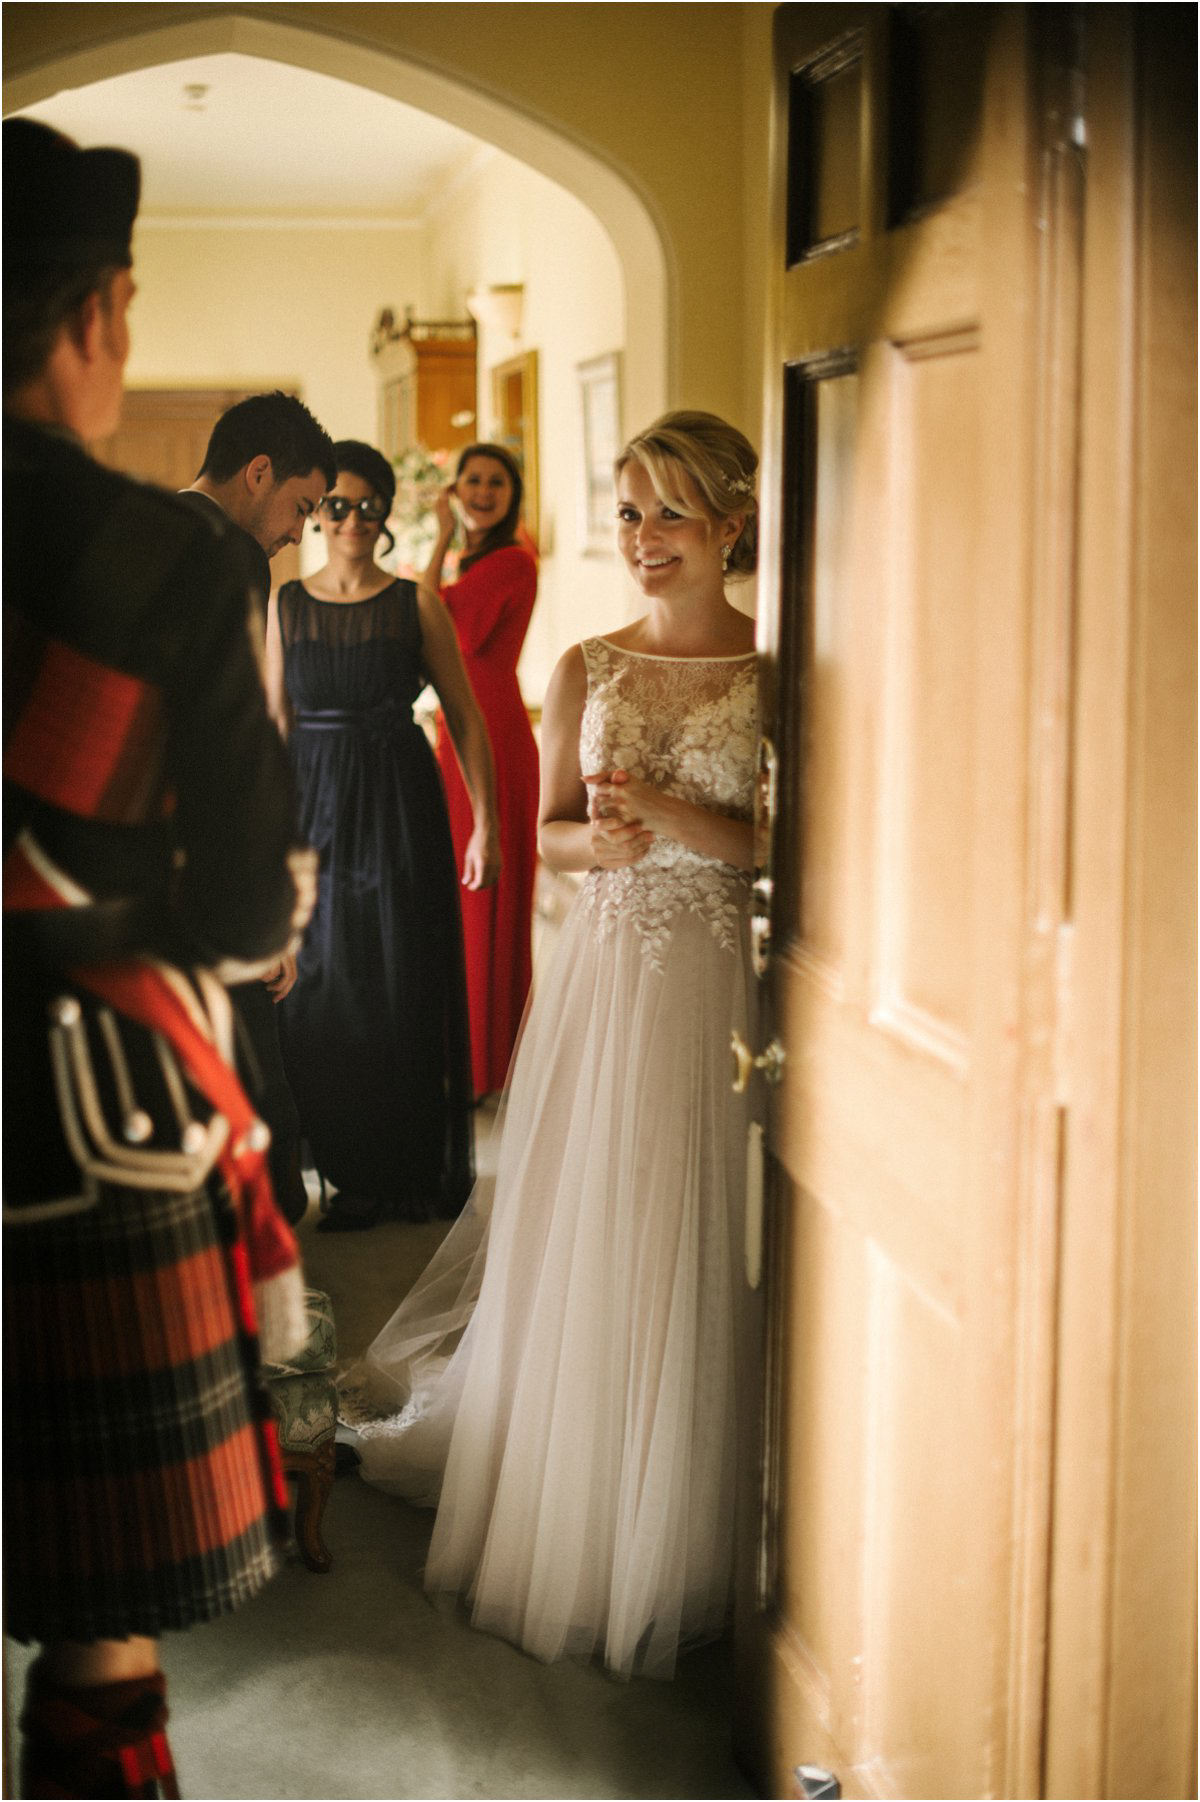 Crofts&Kowalczyk_DundasCastle_WeddingPhotography_Hannah&Tom-79.jpg